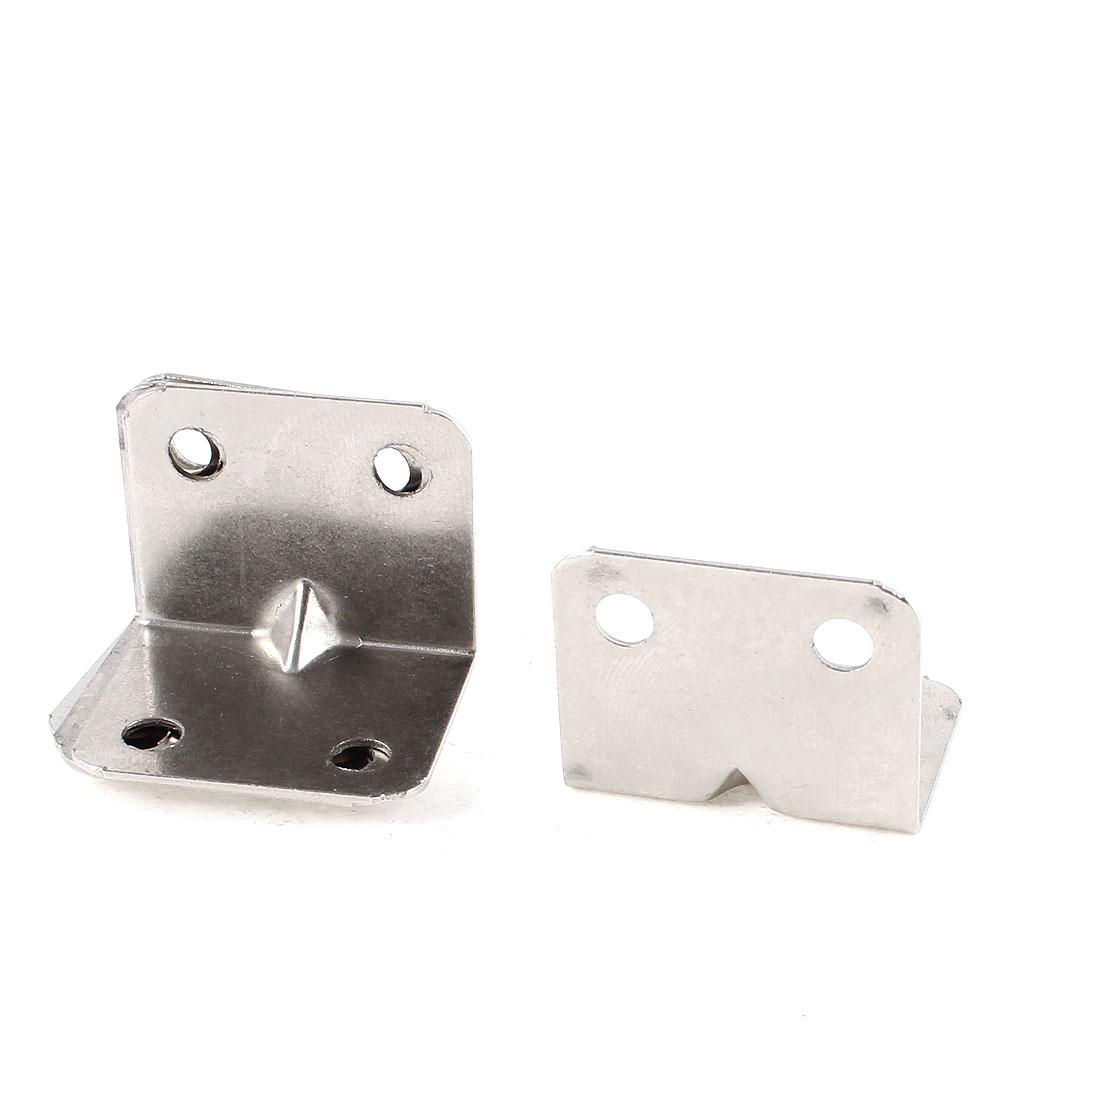 5 Pcs Furniture Metal Right Angle Corner Brace Shelf Brackets 30mmx25mm